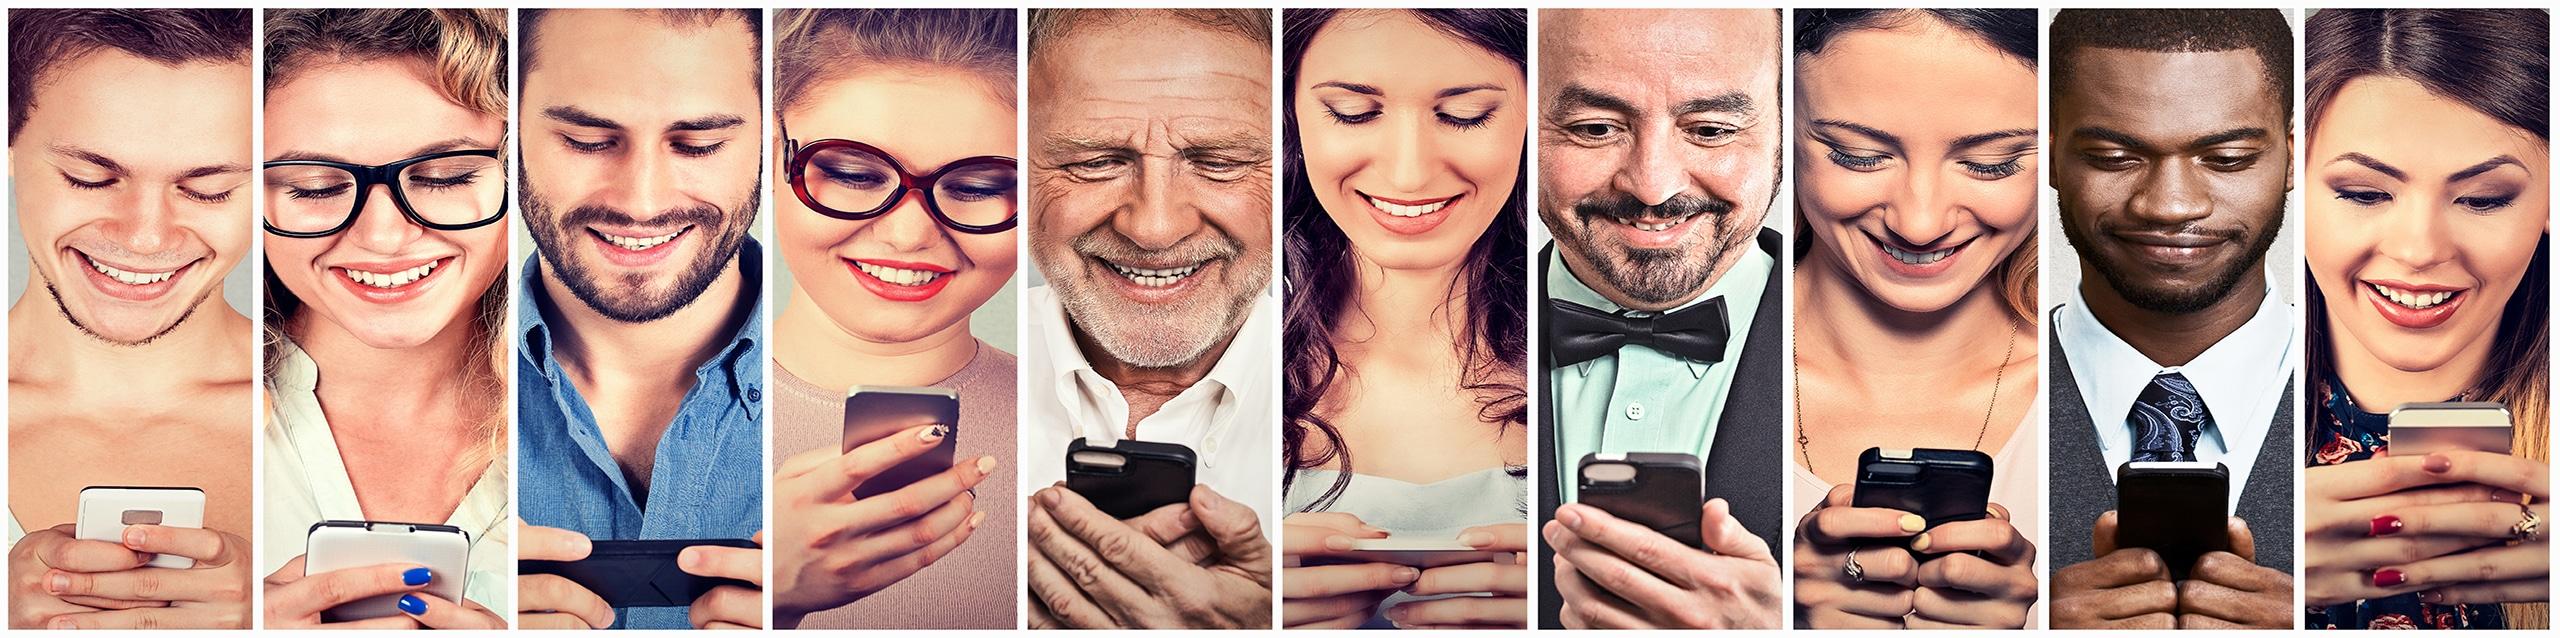 Happy people using mobile smart phone Social Media